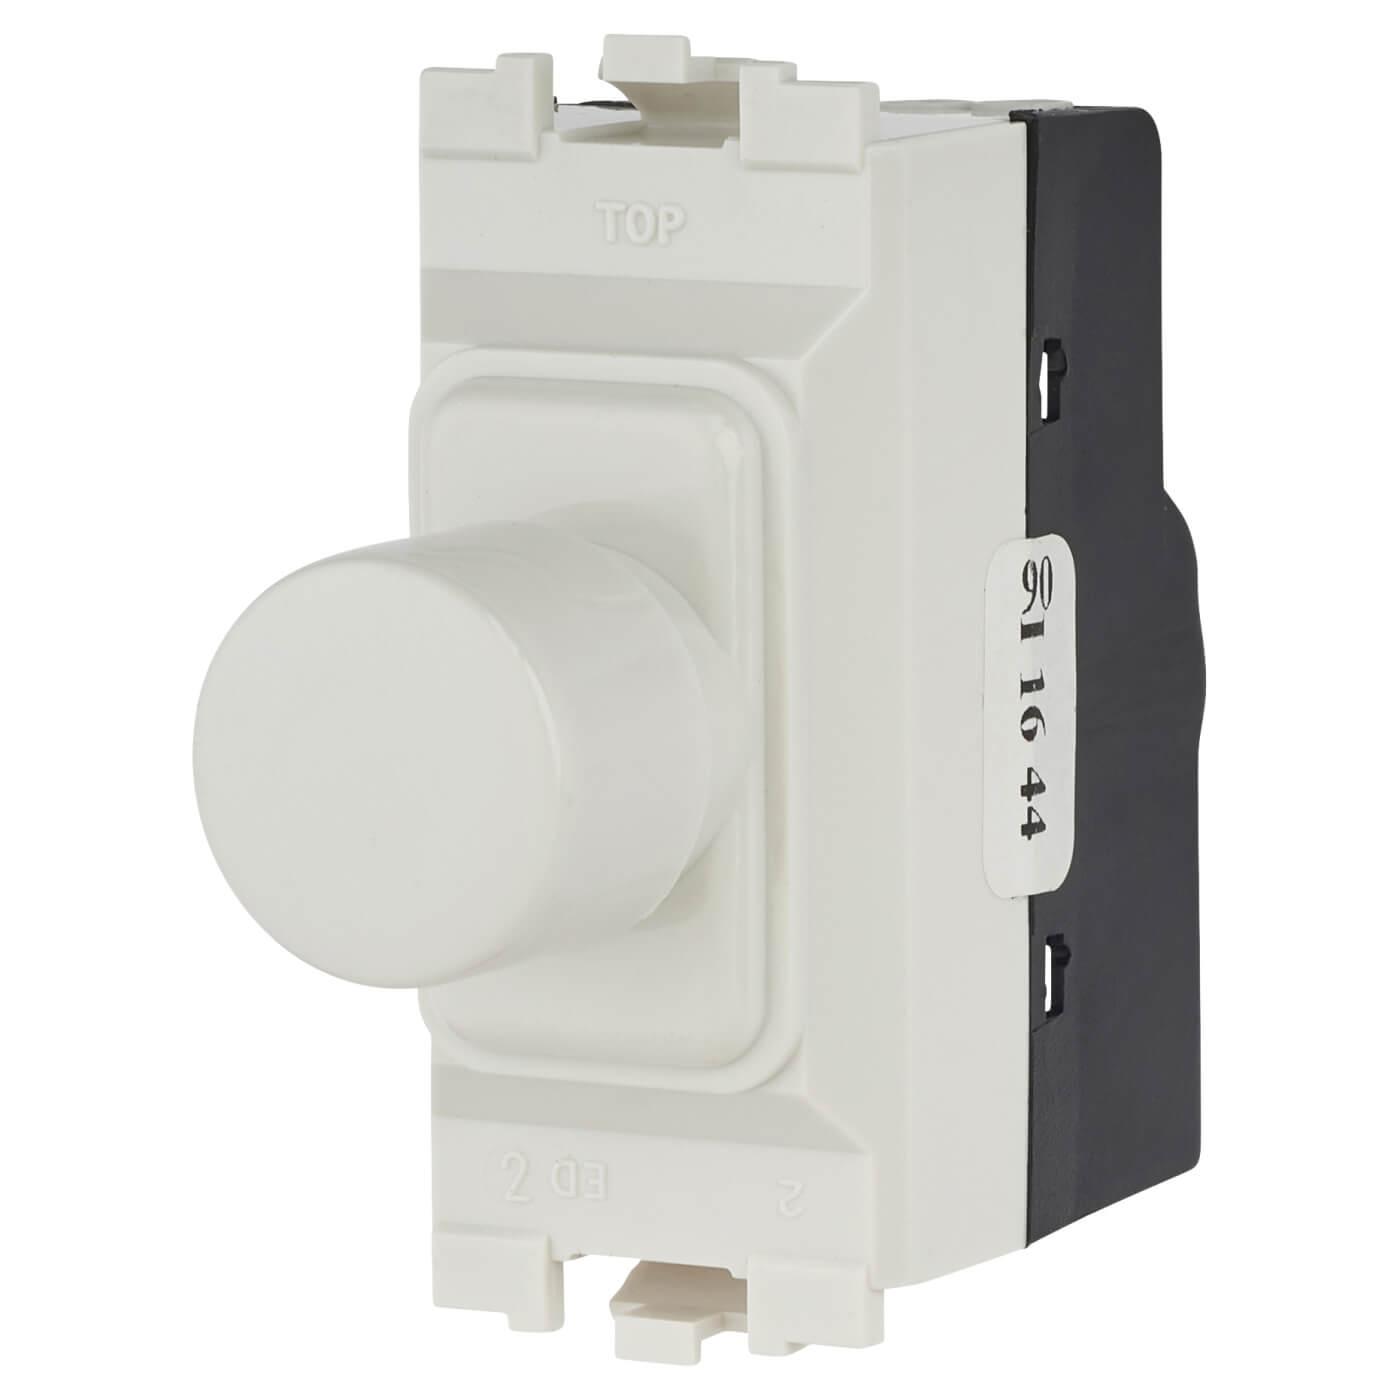 Astounding Screened Quadplexed Outlet White Electricaldirect Wiring Digital Resources Jebrpkbiperorg